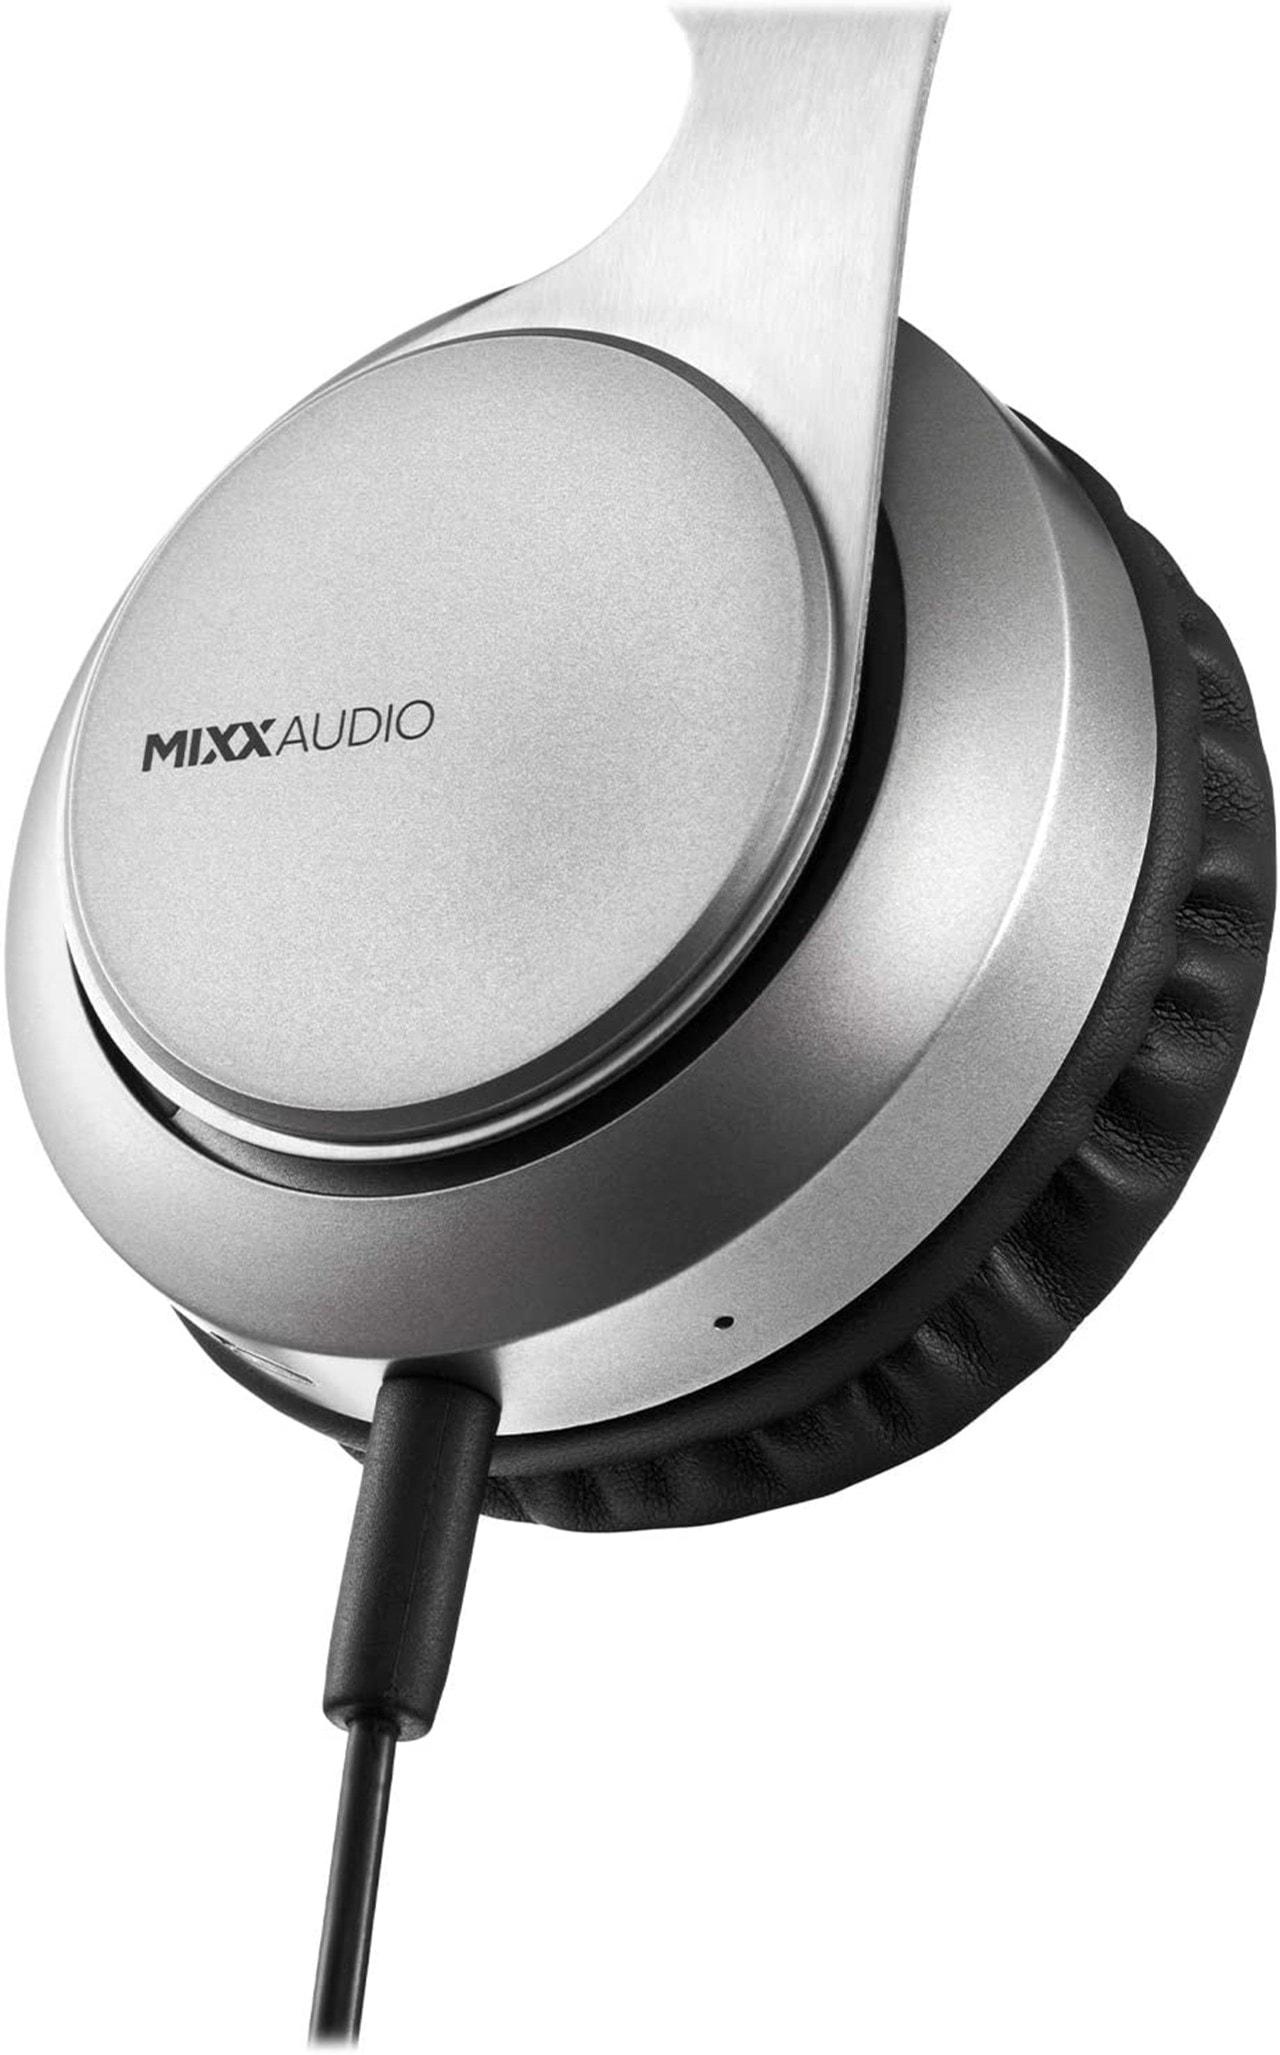 Mixx Audio JX1 Space Grey On Ear Bluetooth Headphones - 6